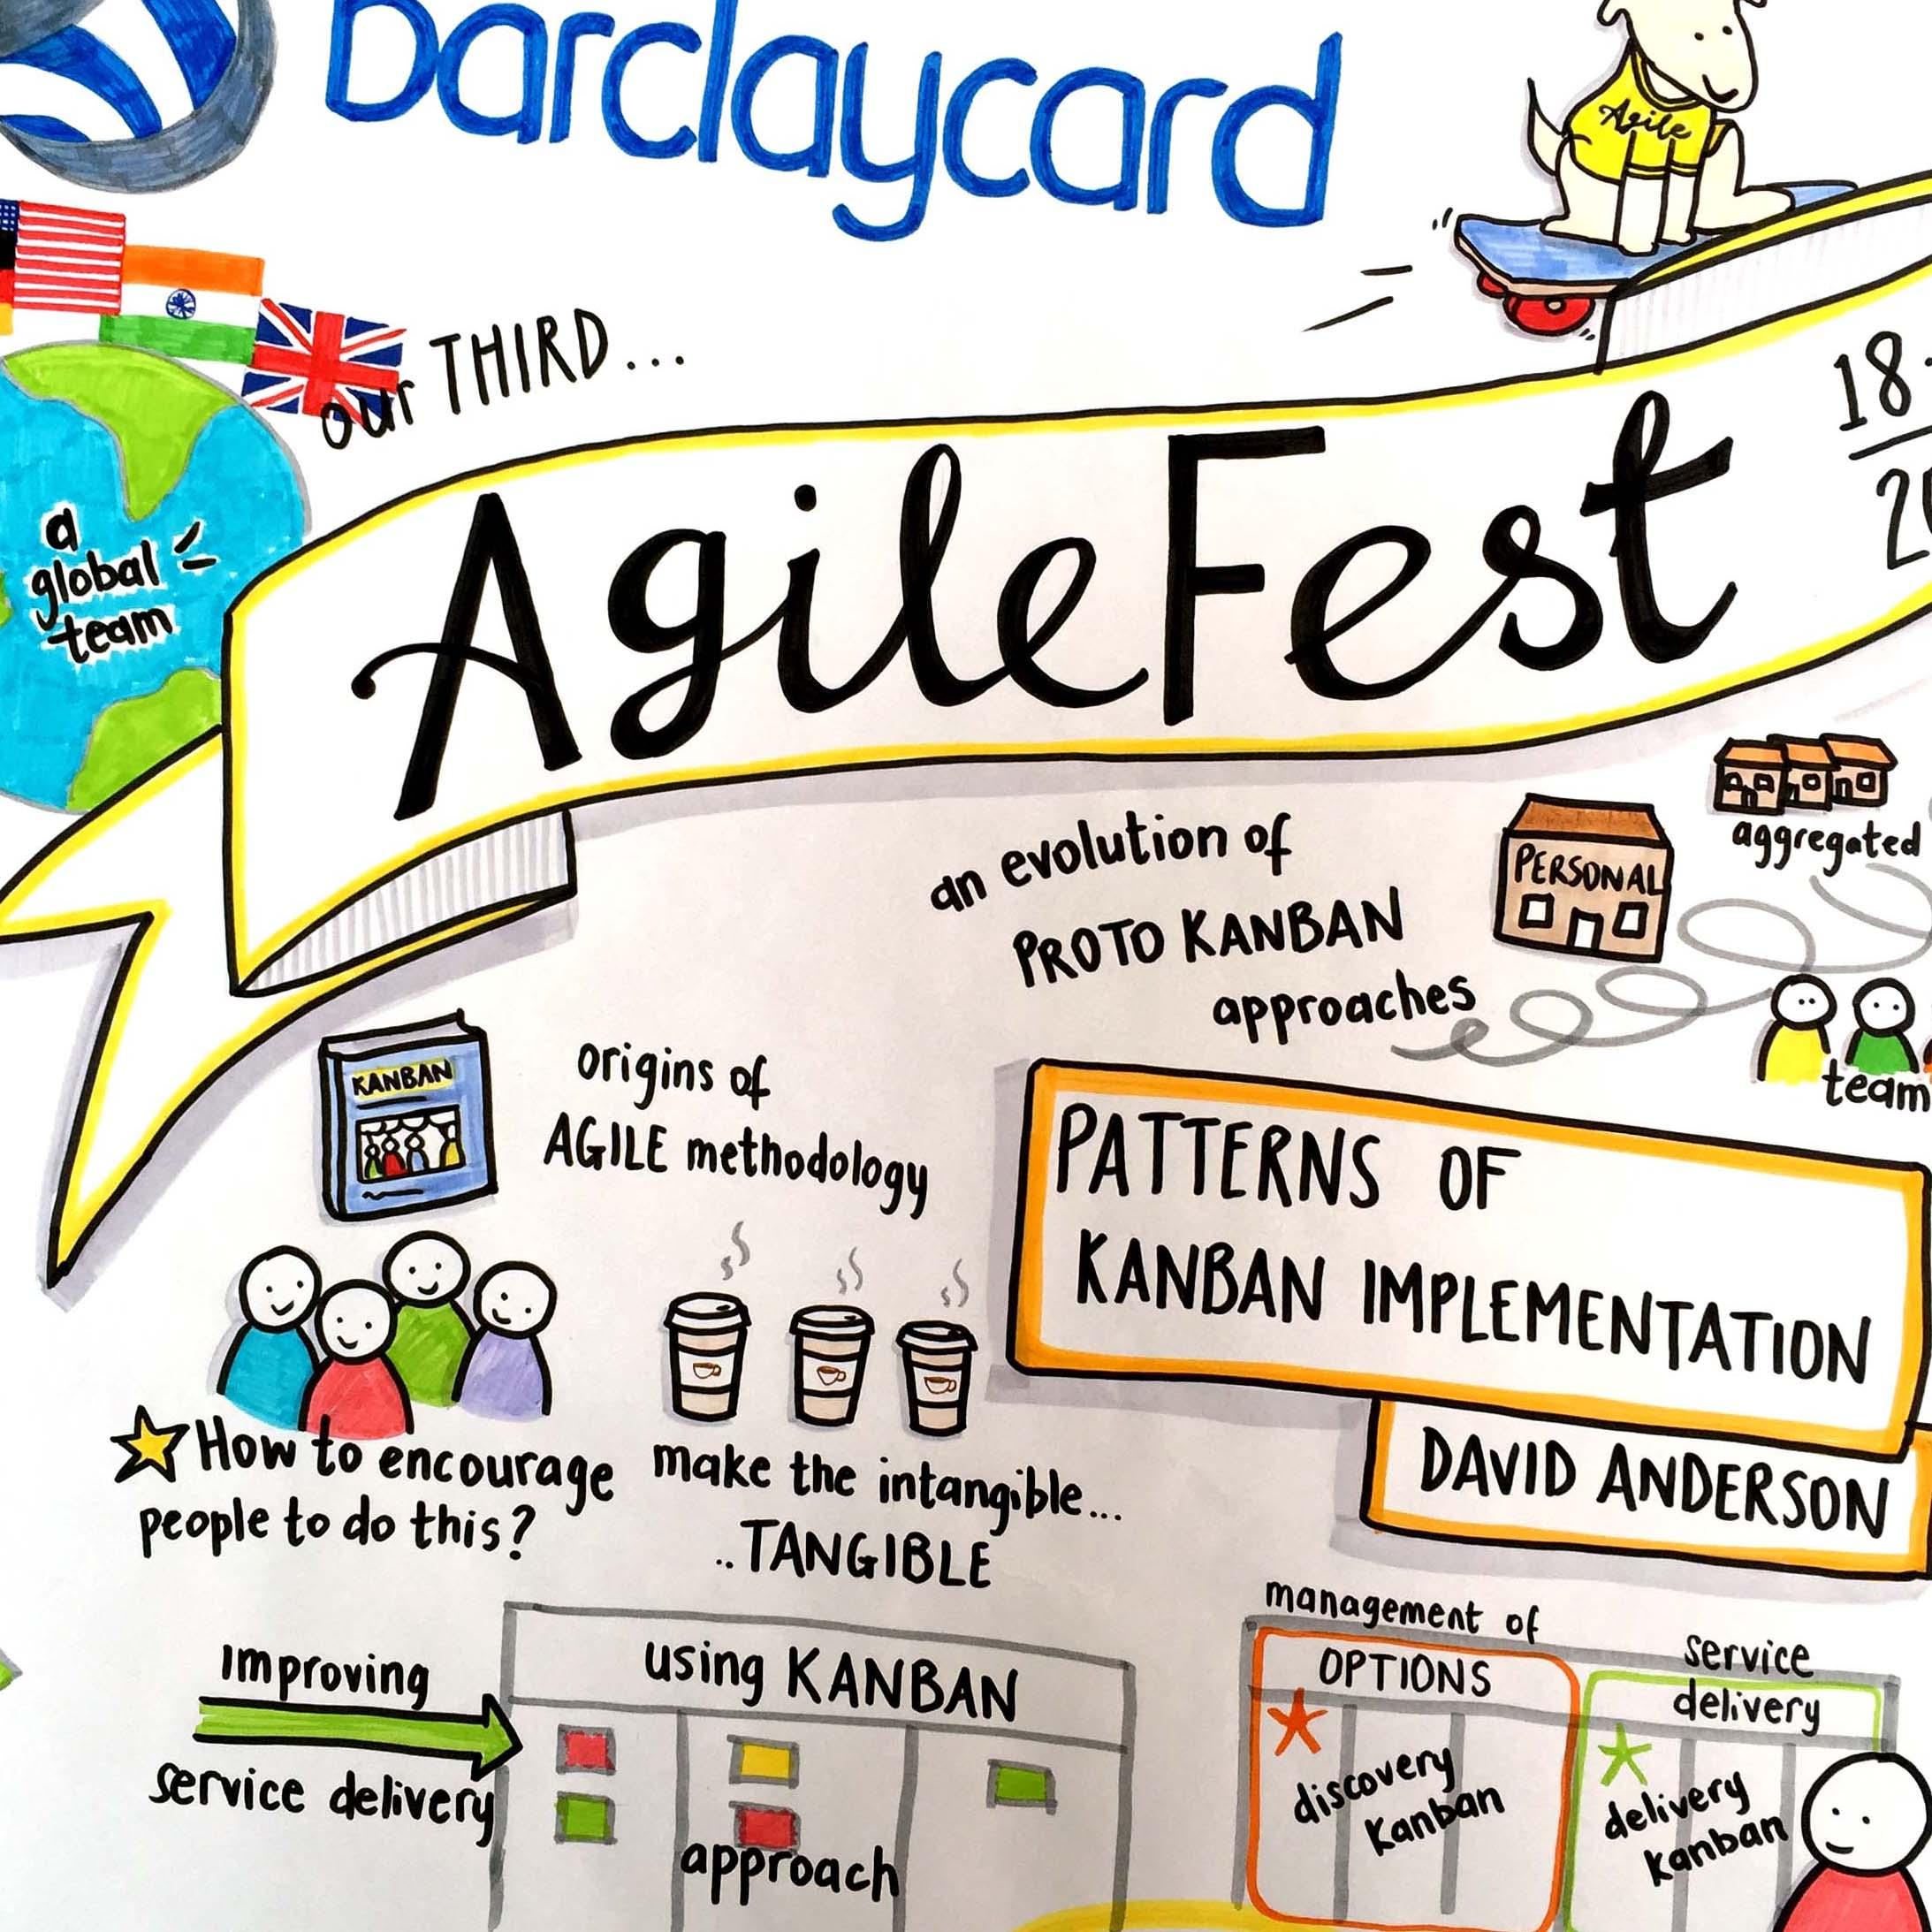 agilefest centre section close up 2.jpg